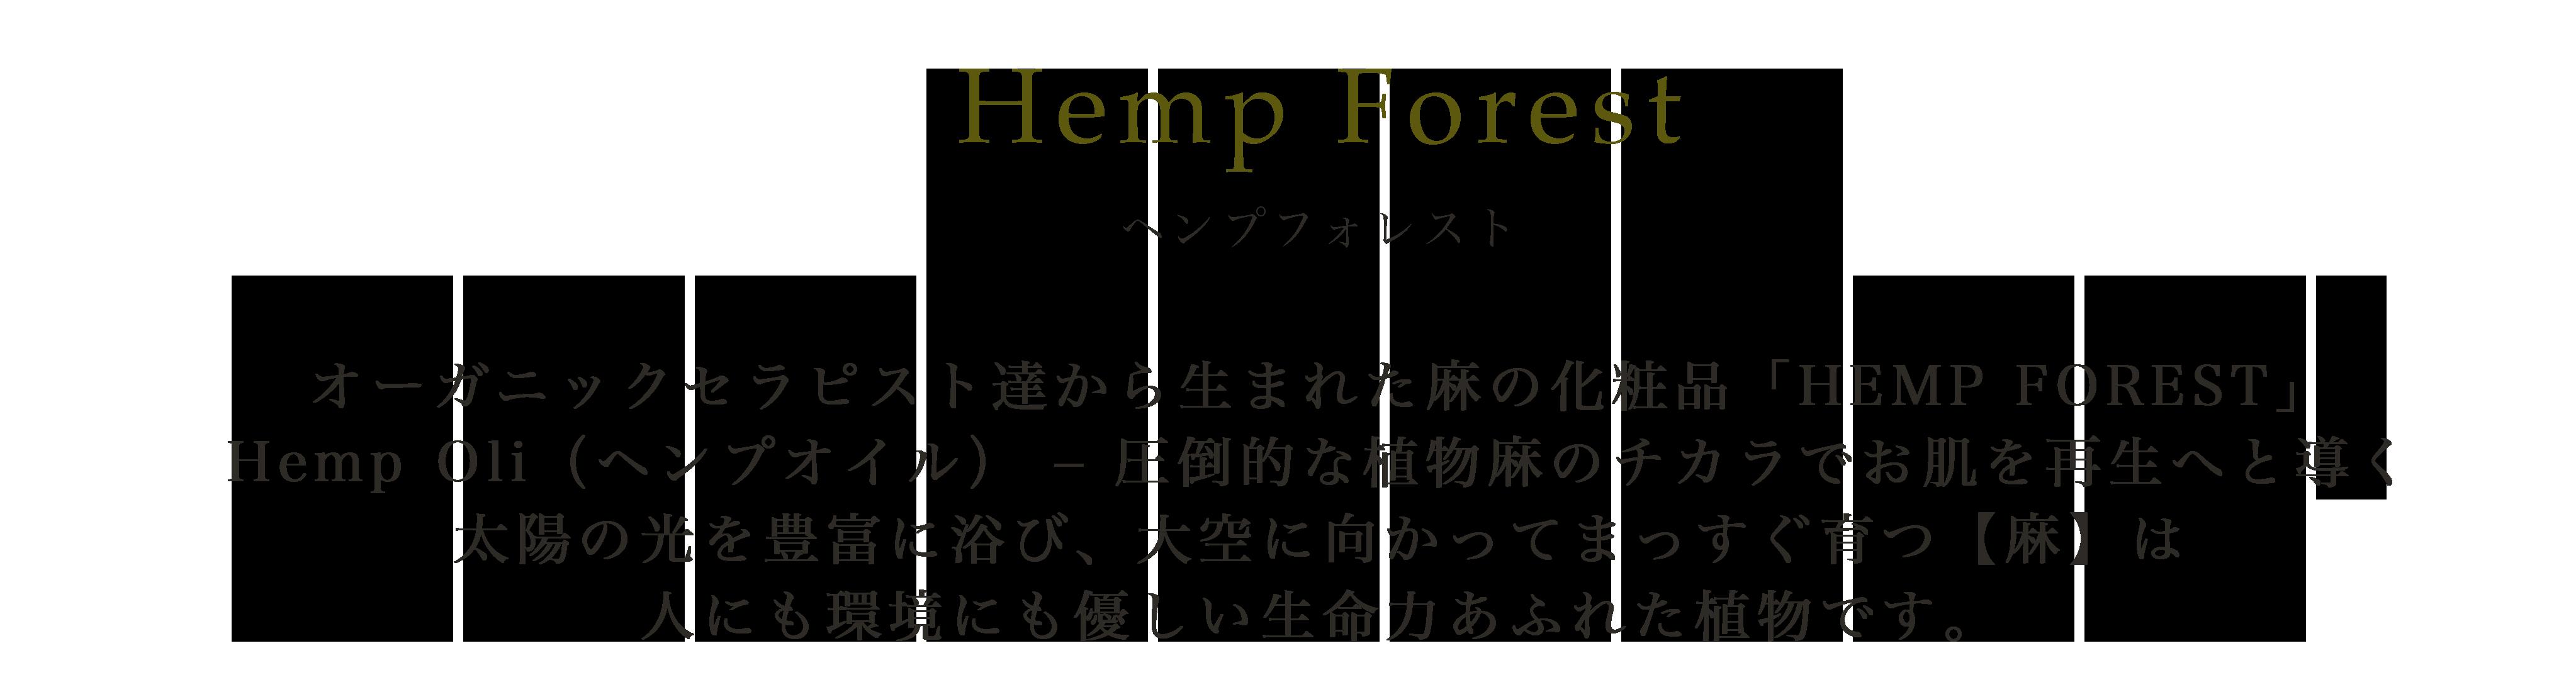 Hemp Forest